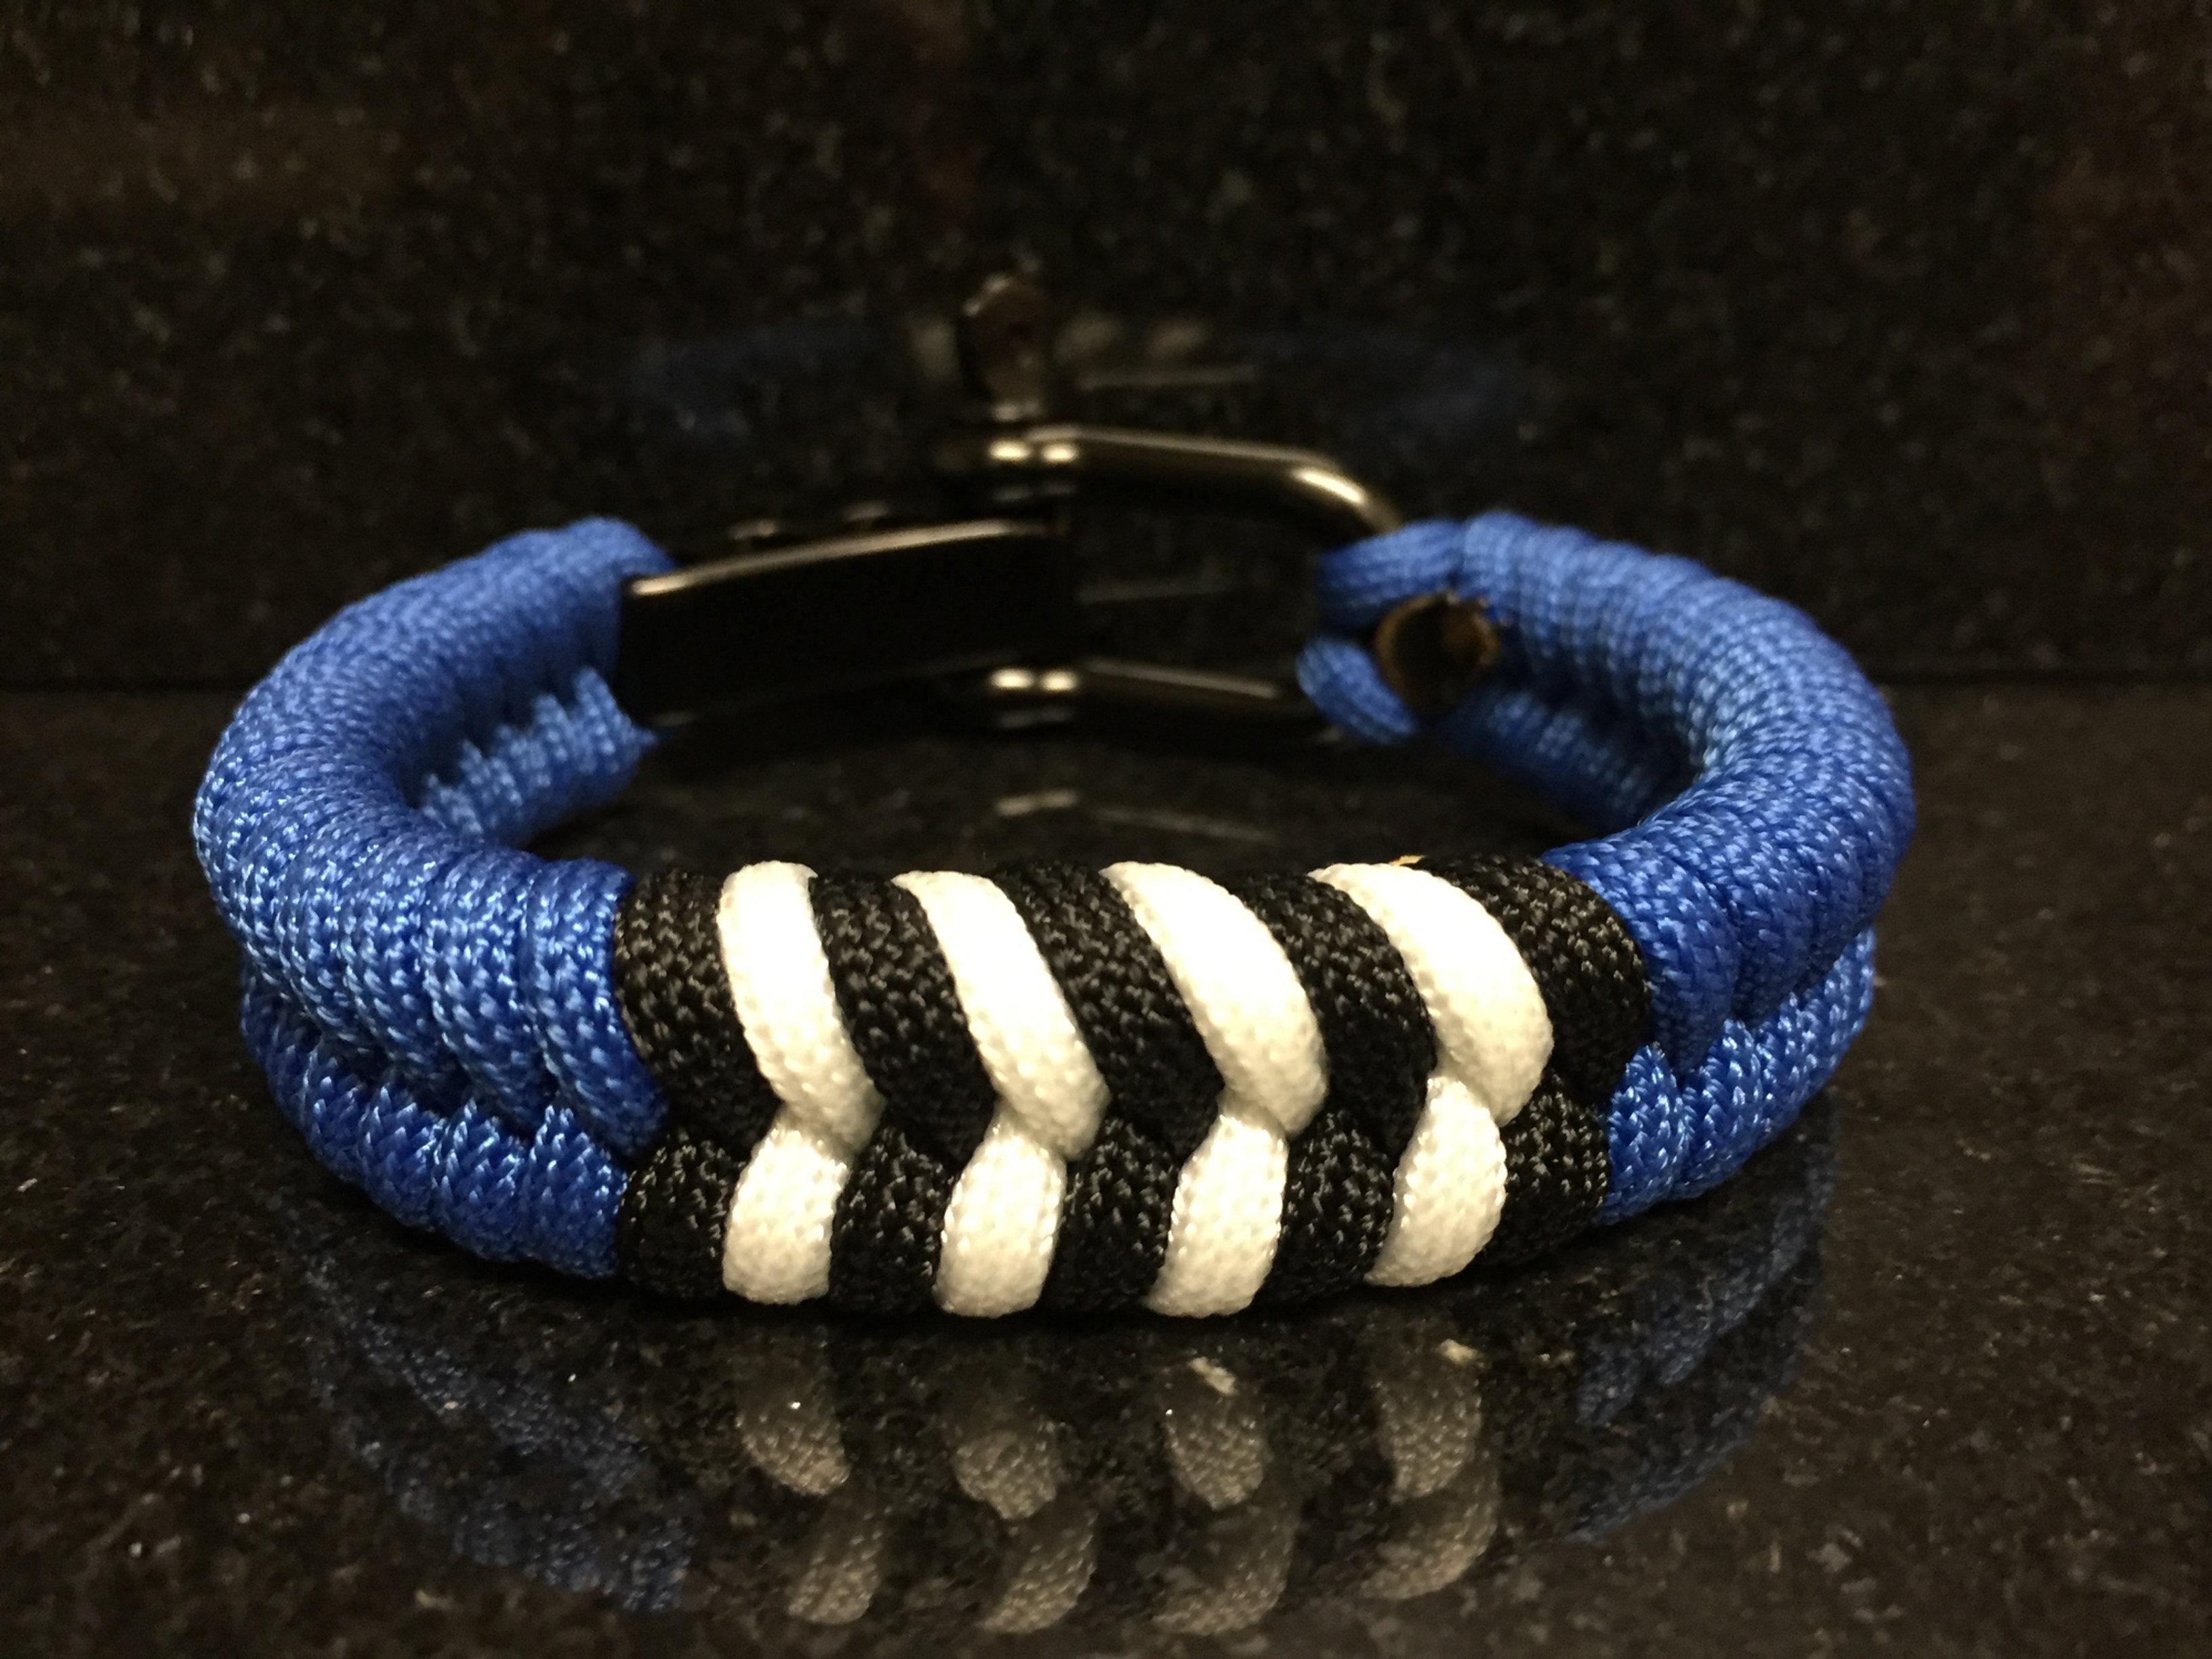 Brazilian Jiu Jitsu Blue Belt Rank Paracord Bracelet